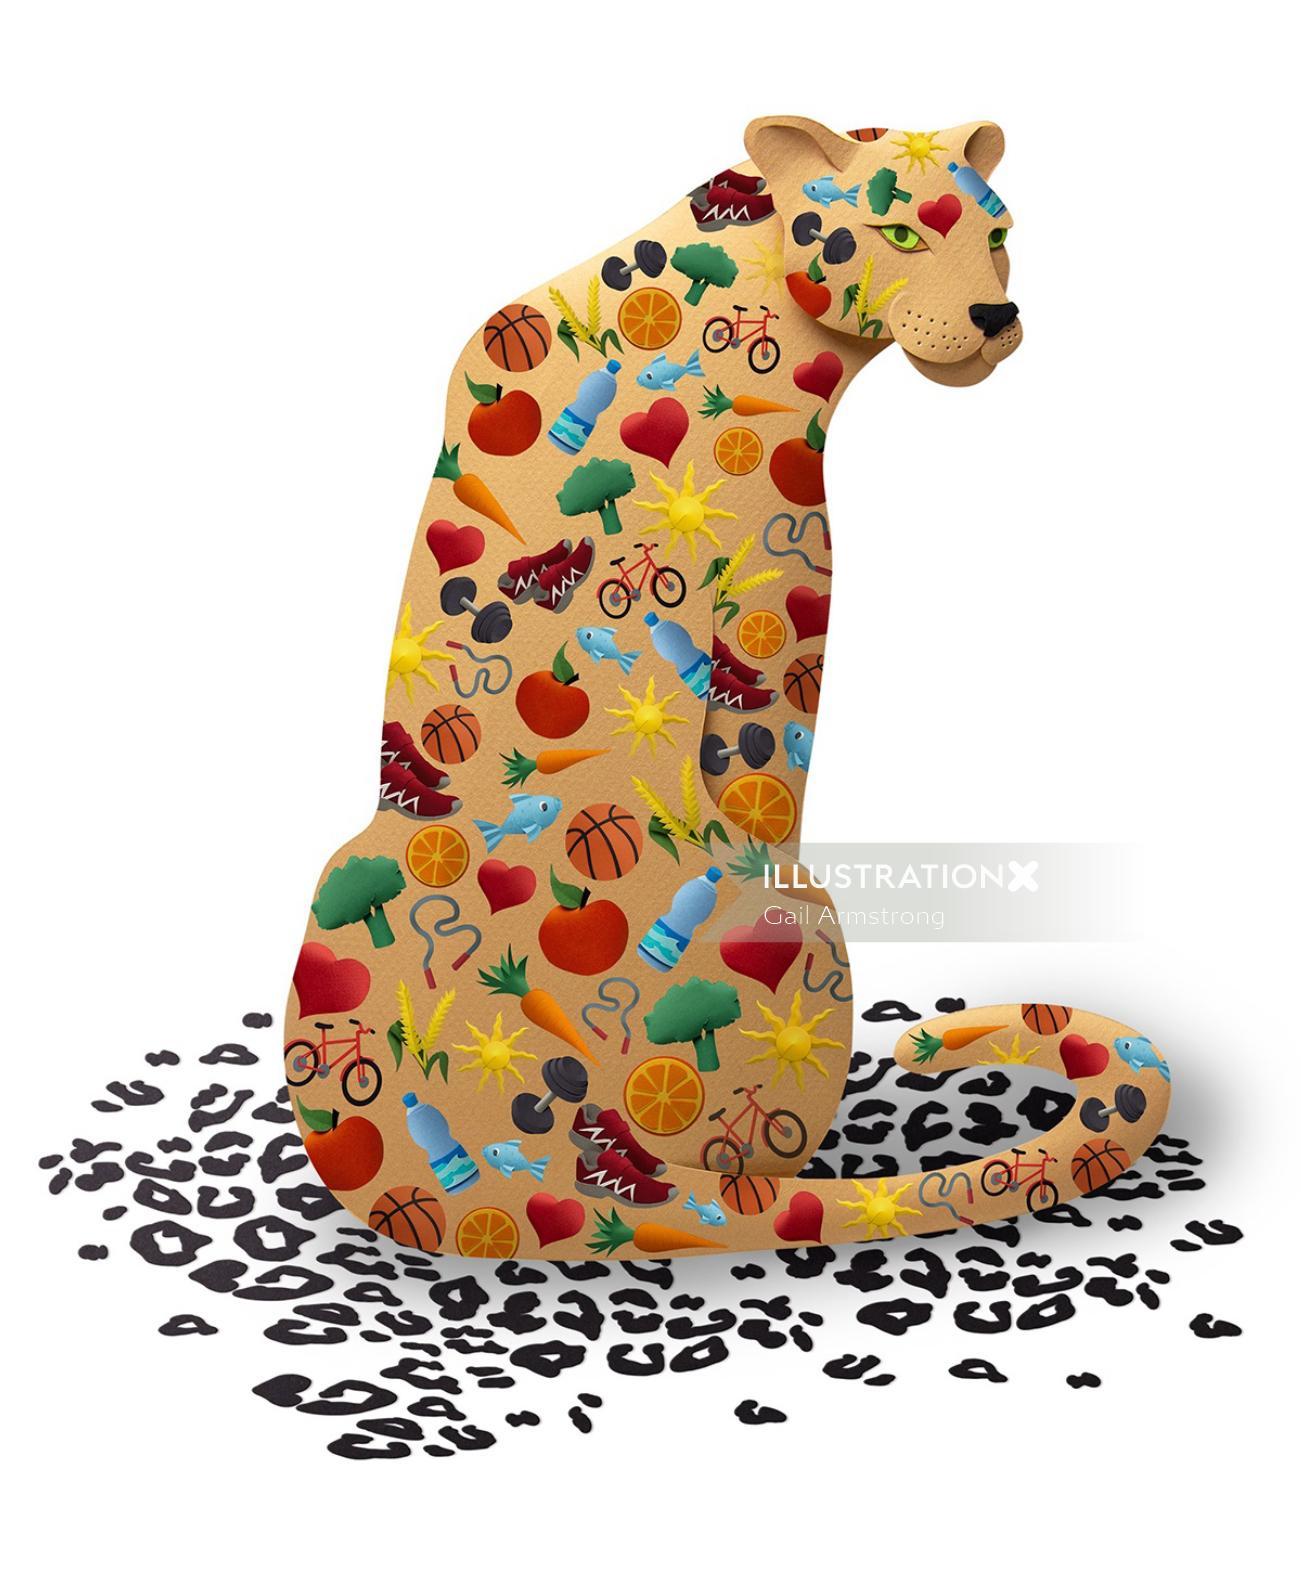 Illustration of colorful Cheetah